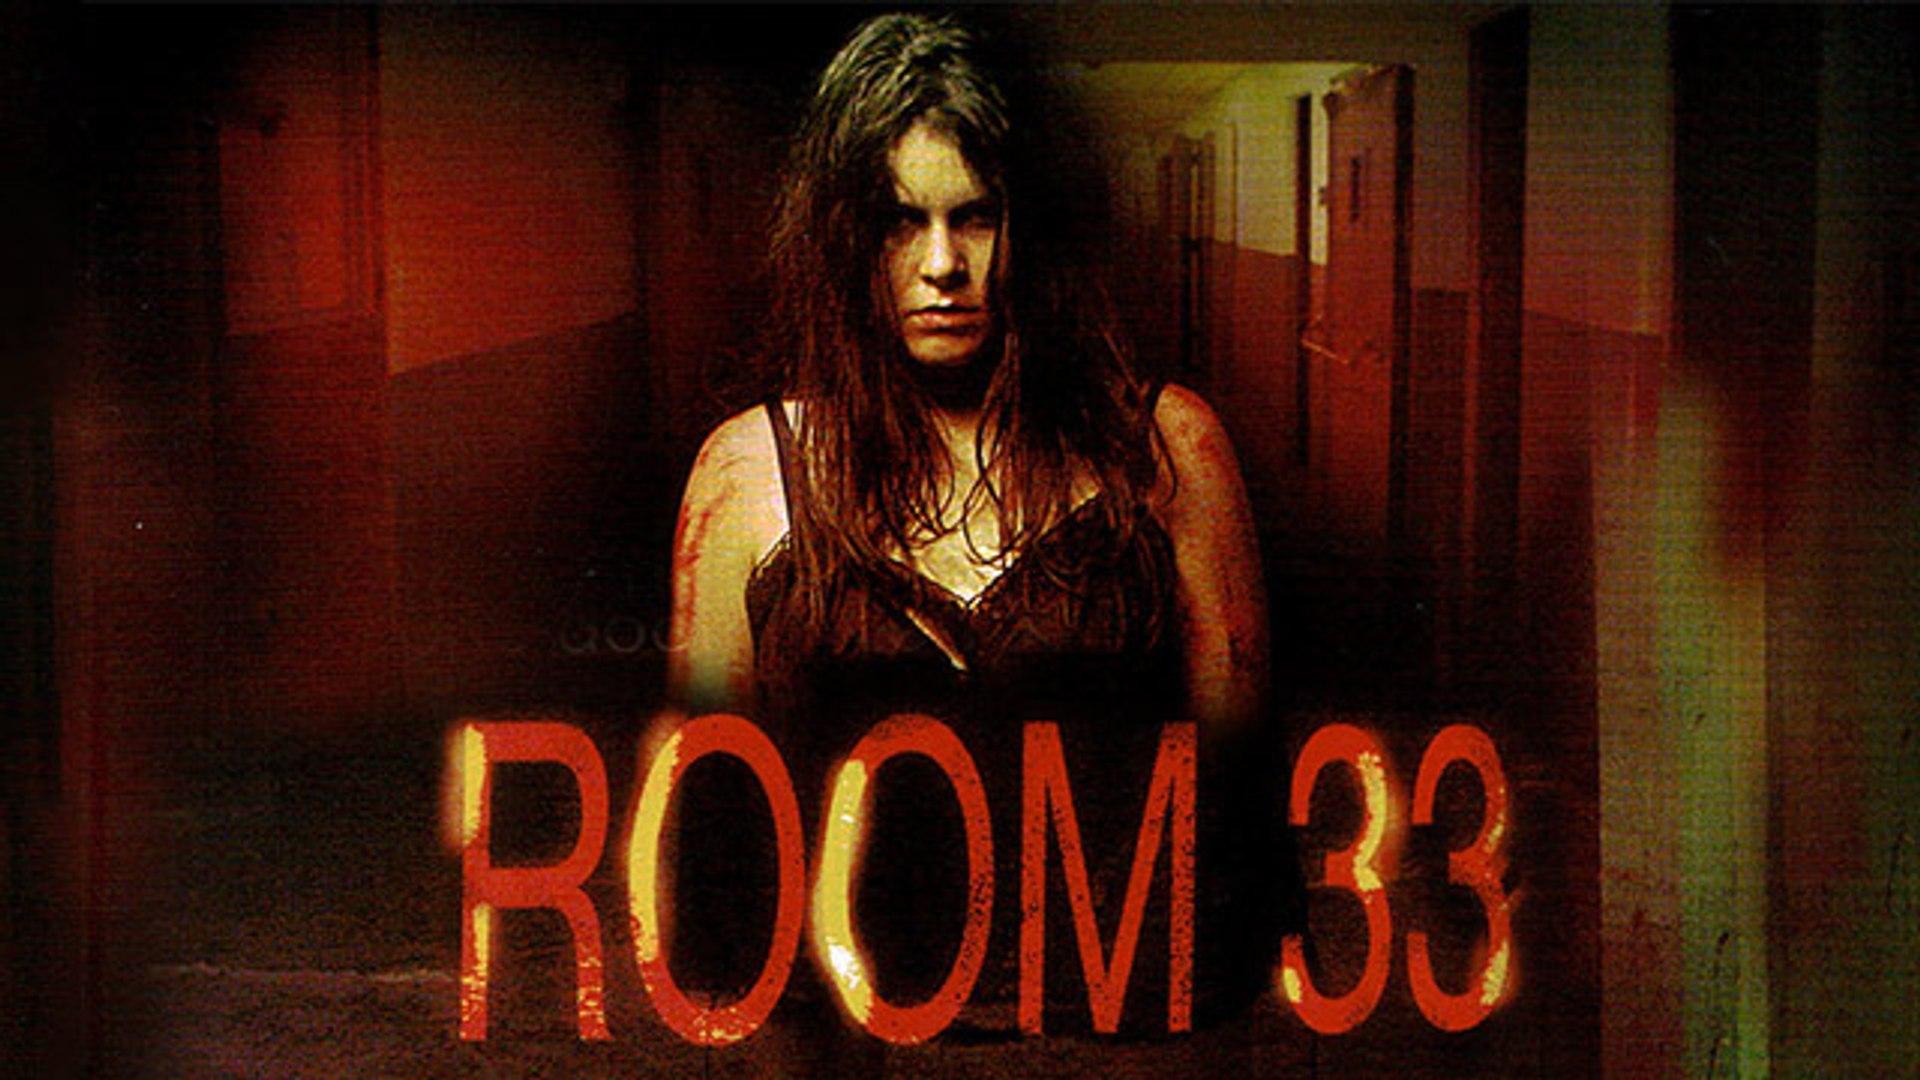 Room 33 Aka Fear Asylum Full Horror Movie For Free Video Dailymotion